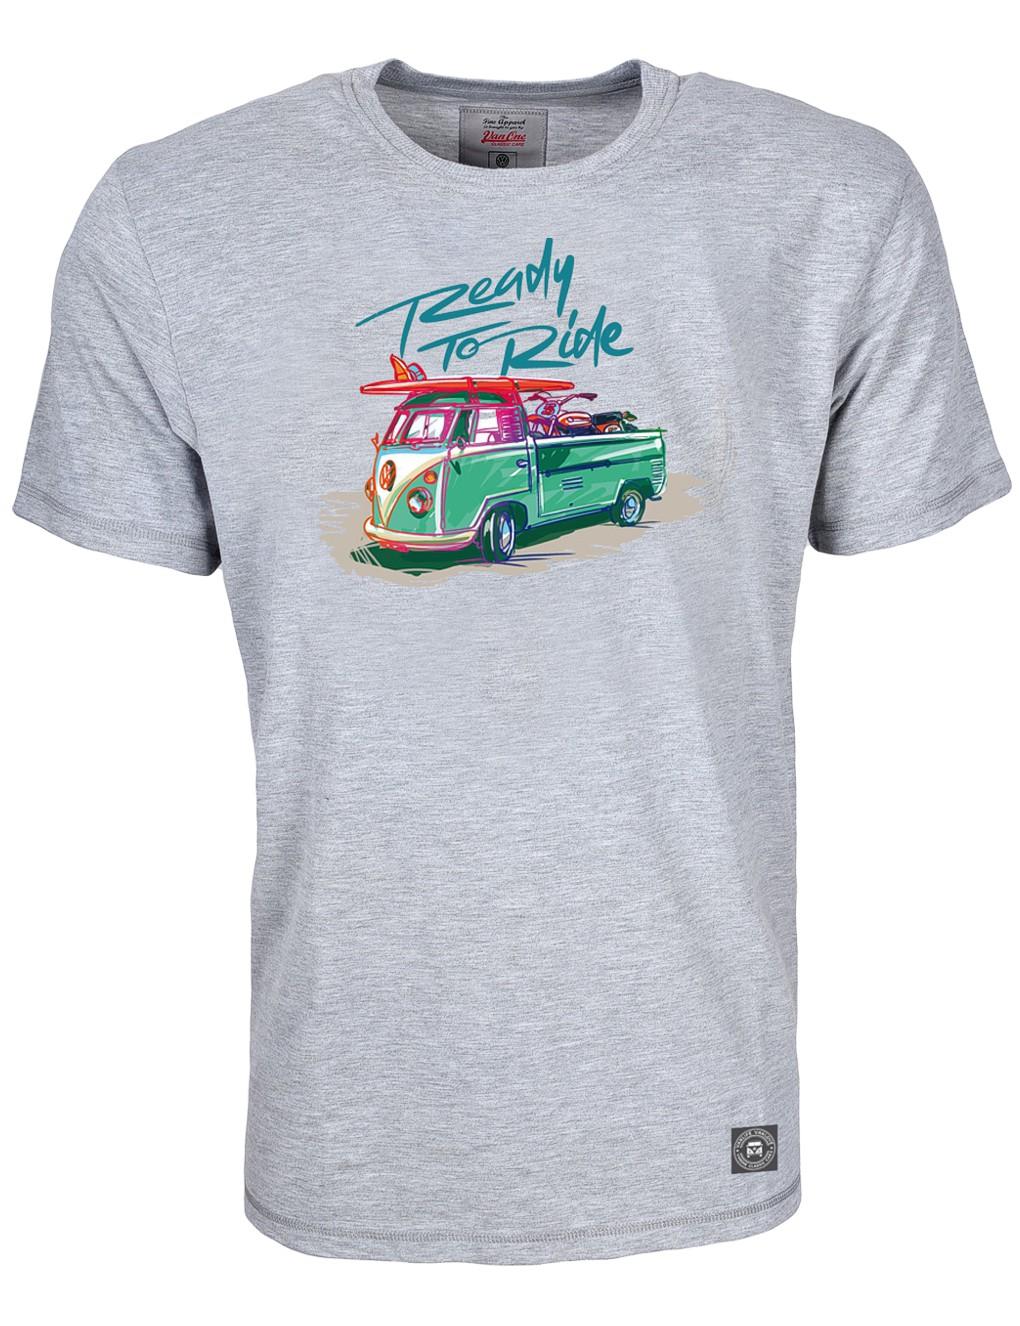 Herren T-Shirt VW Bulli »READY TO RIDE« Grau